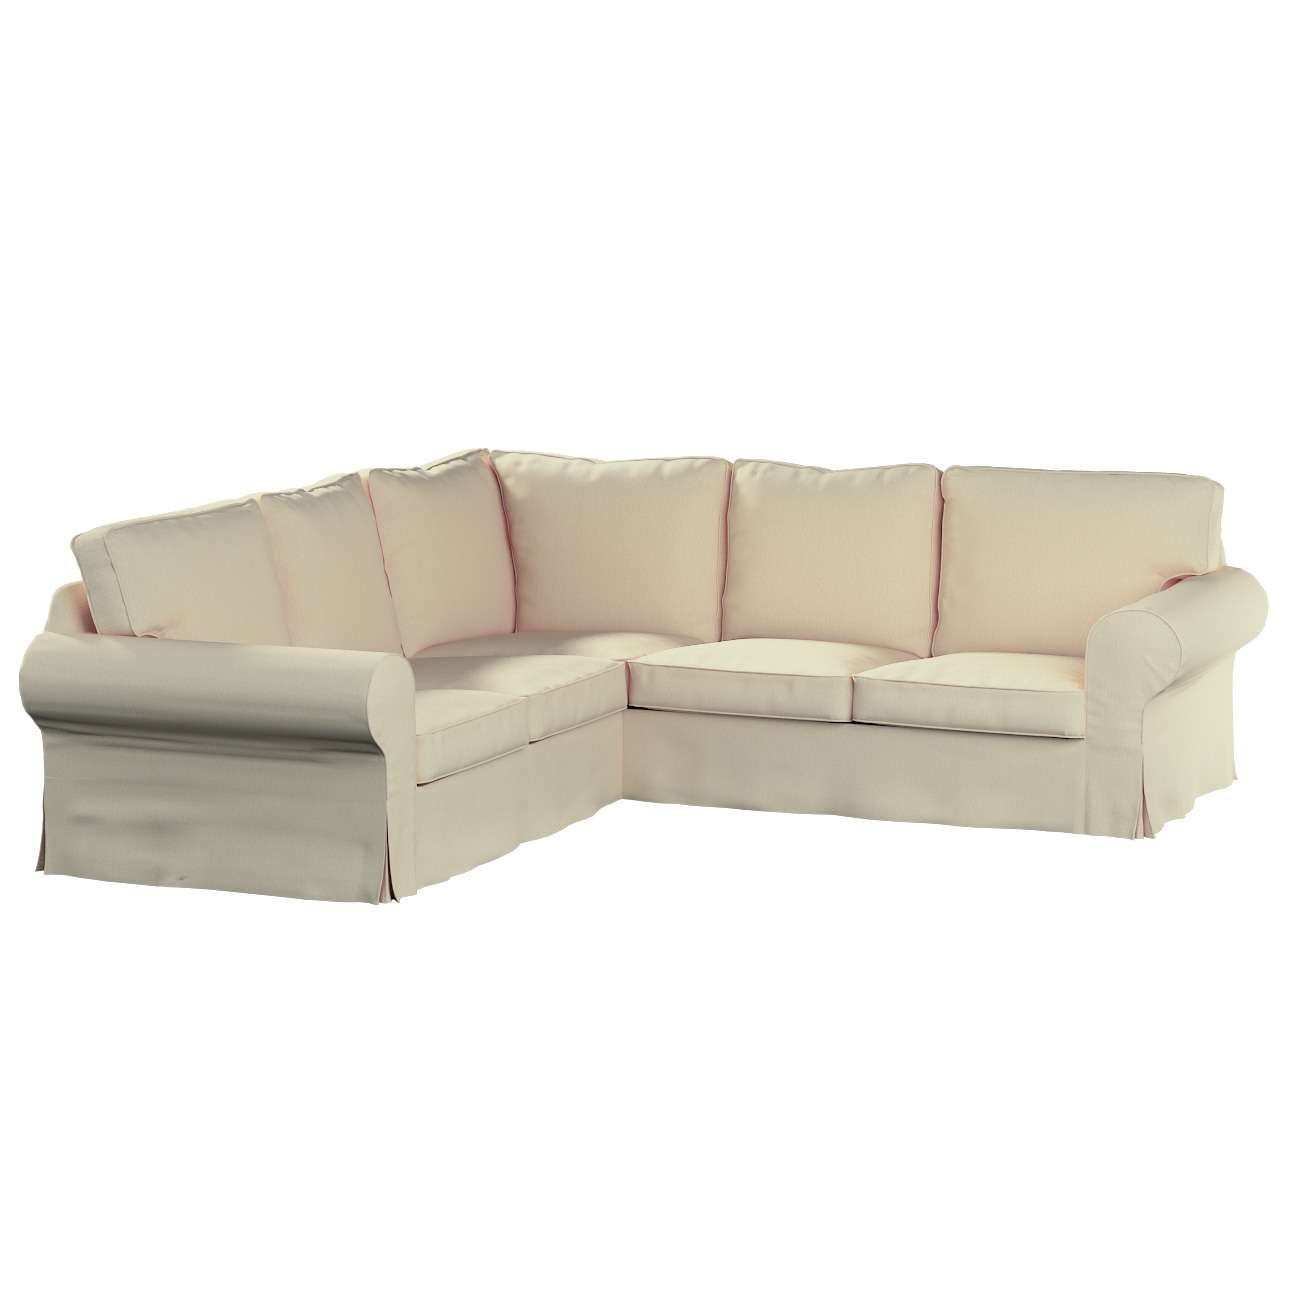 Ektorp kampinė sofa Ektorp kampinė sofa kolekcijoje Chenille, audinys: 702-22